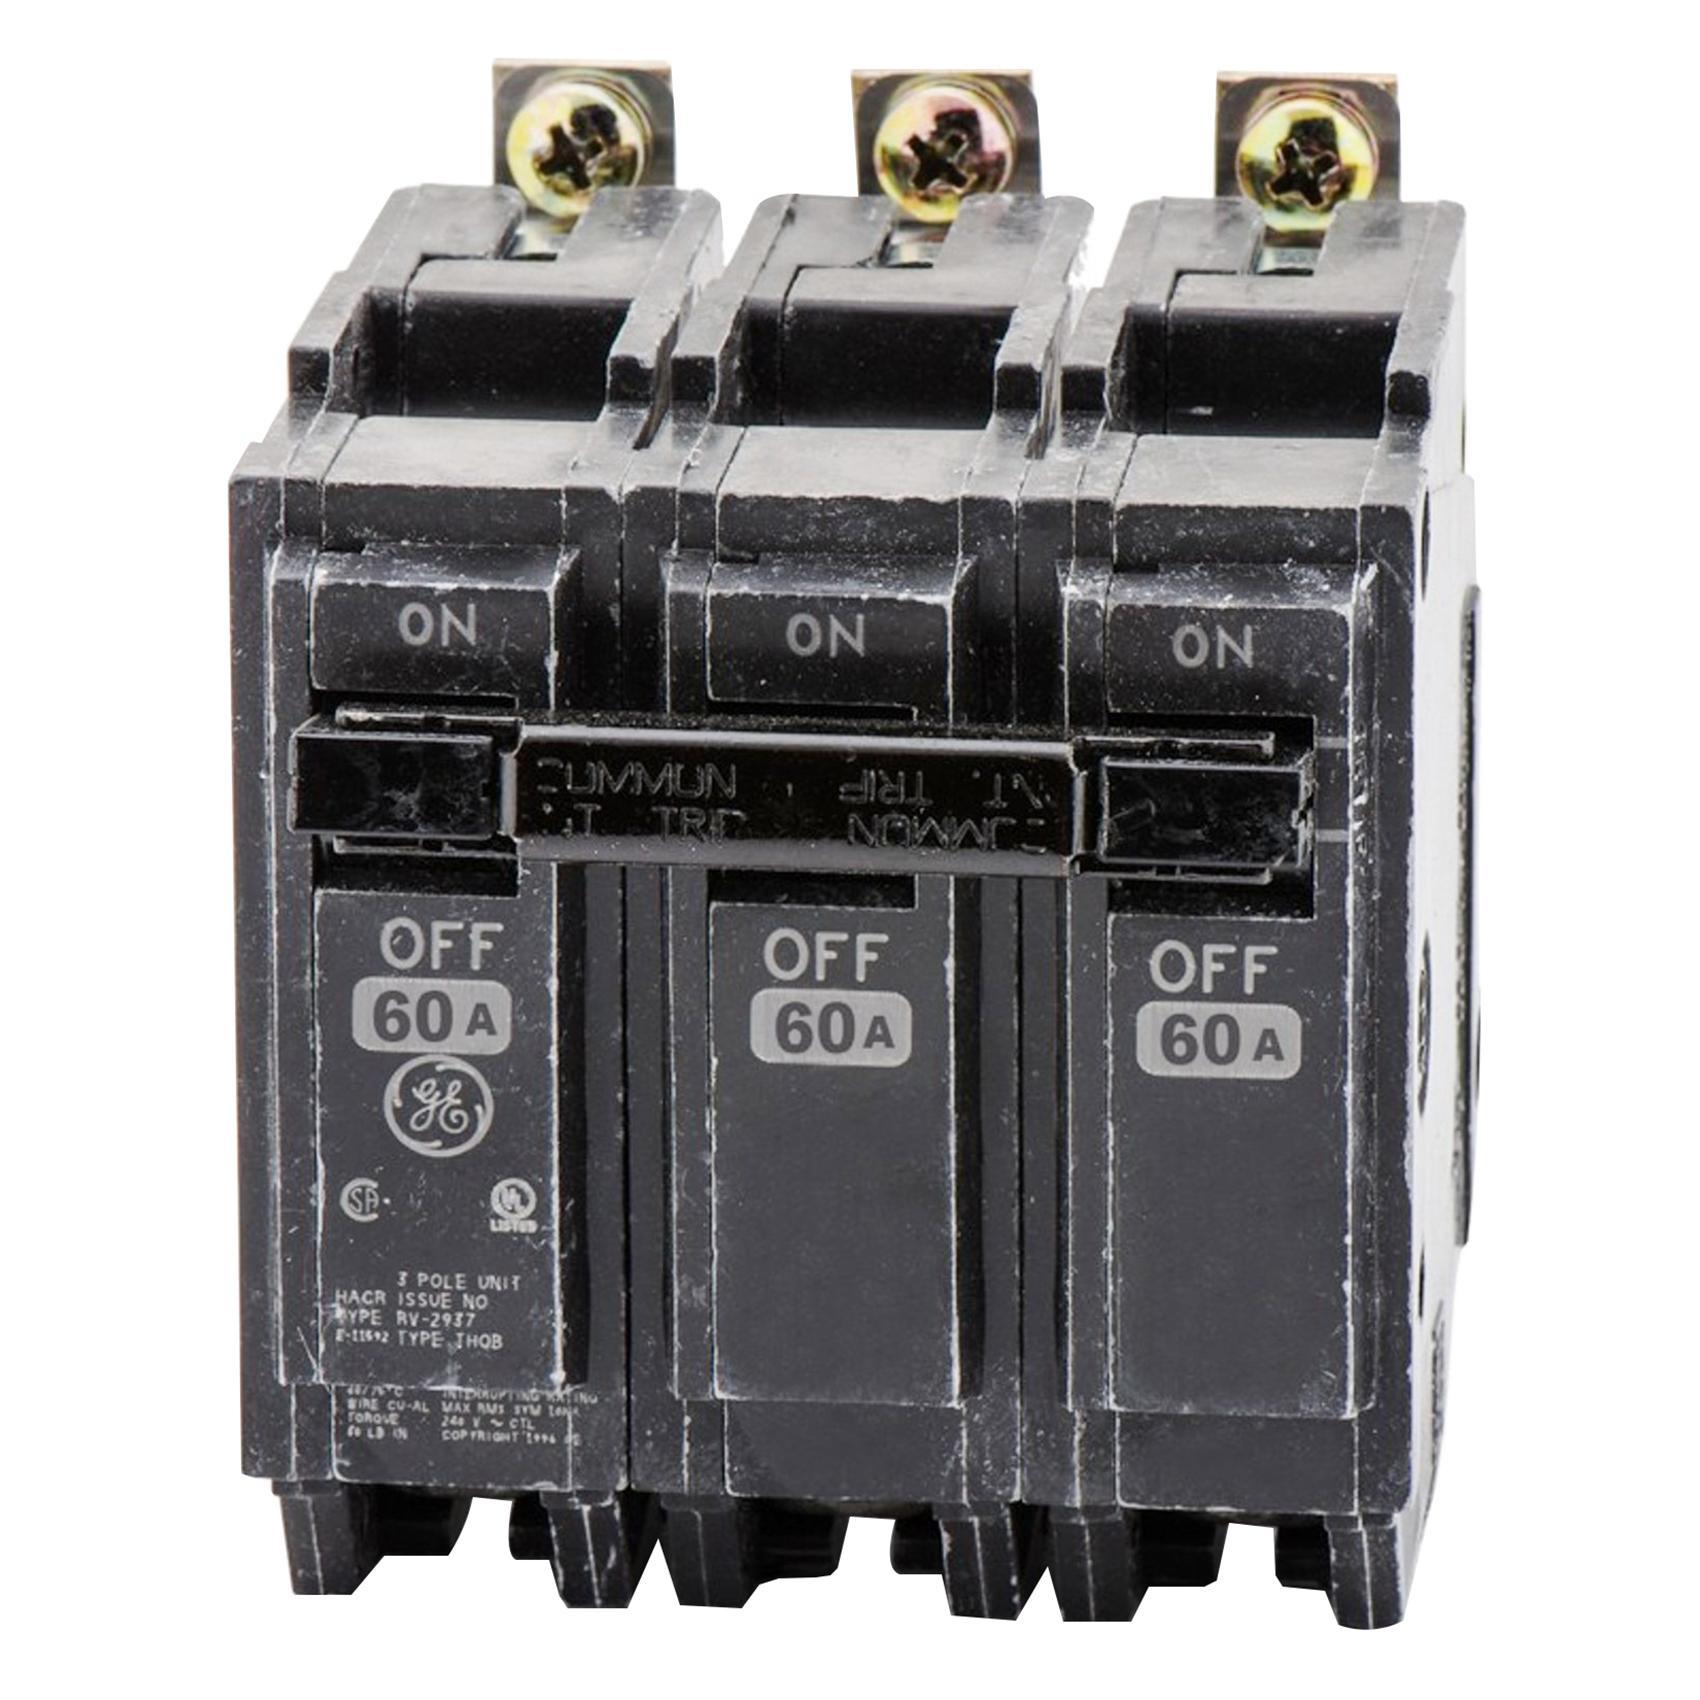 Q Line Miniature Circuit Breakers Wiring Diagram And Ebooks Breaker Ge Industrial Thqb32060 Bolt On Mount Type Thqb Air Abb